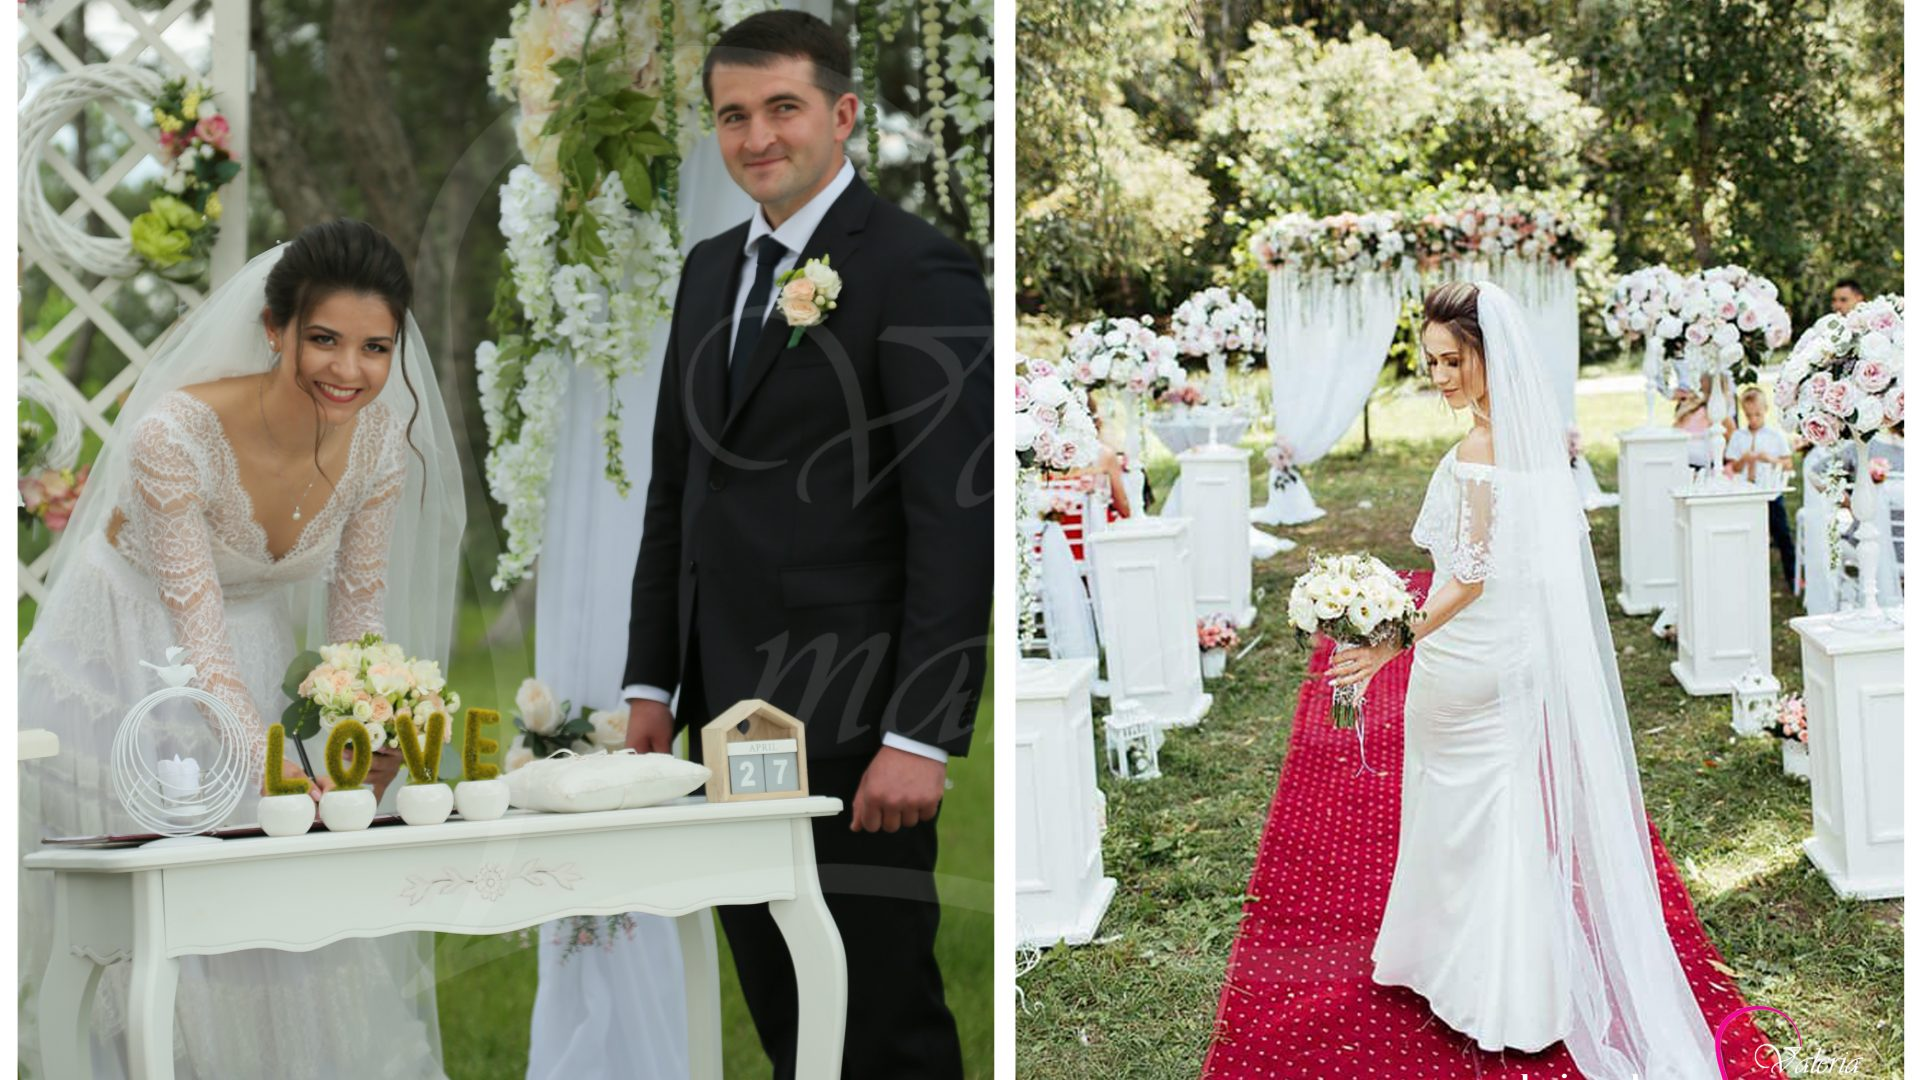 Inregistrarea casatoriei sub cerul liber Agentia Valeria Mariage 069787665 www.valeria (15)